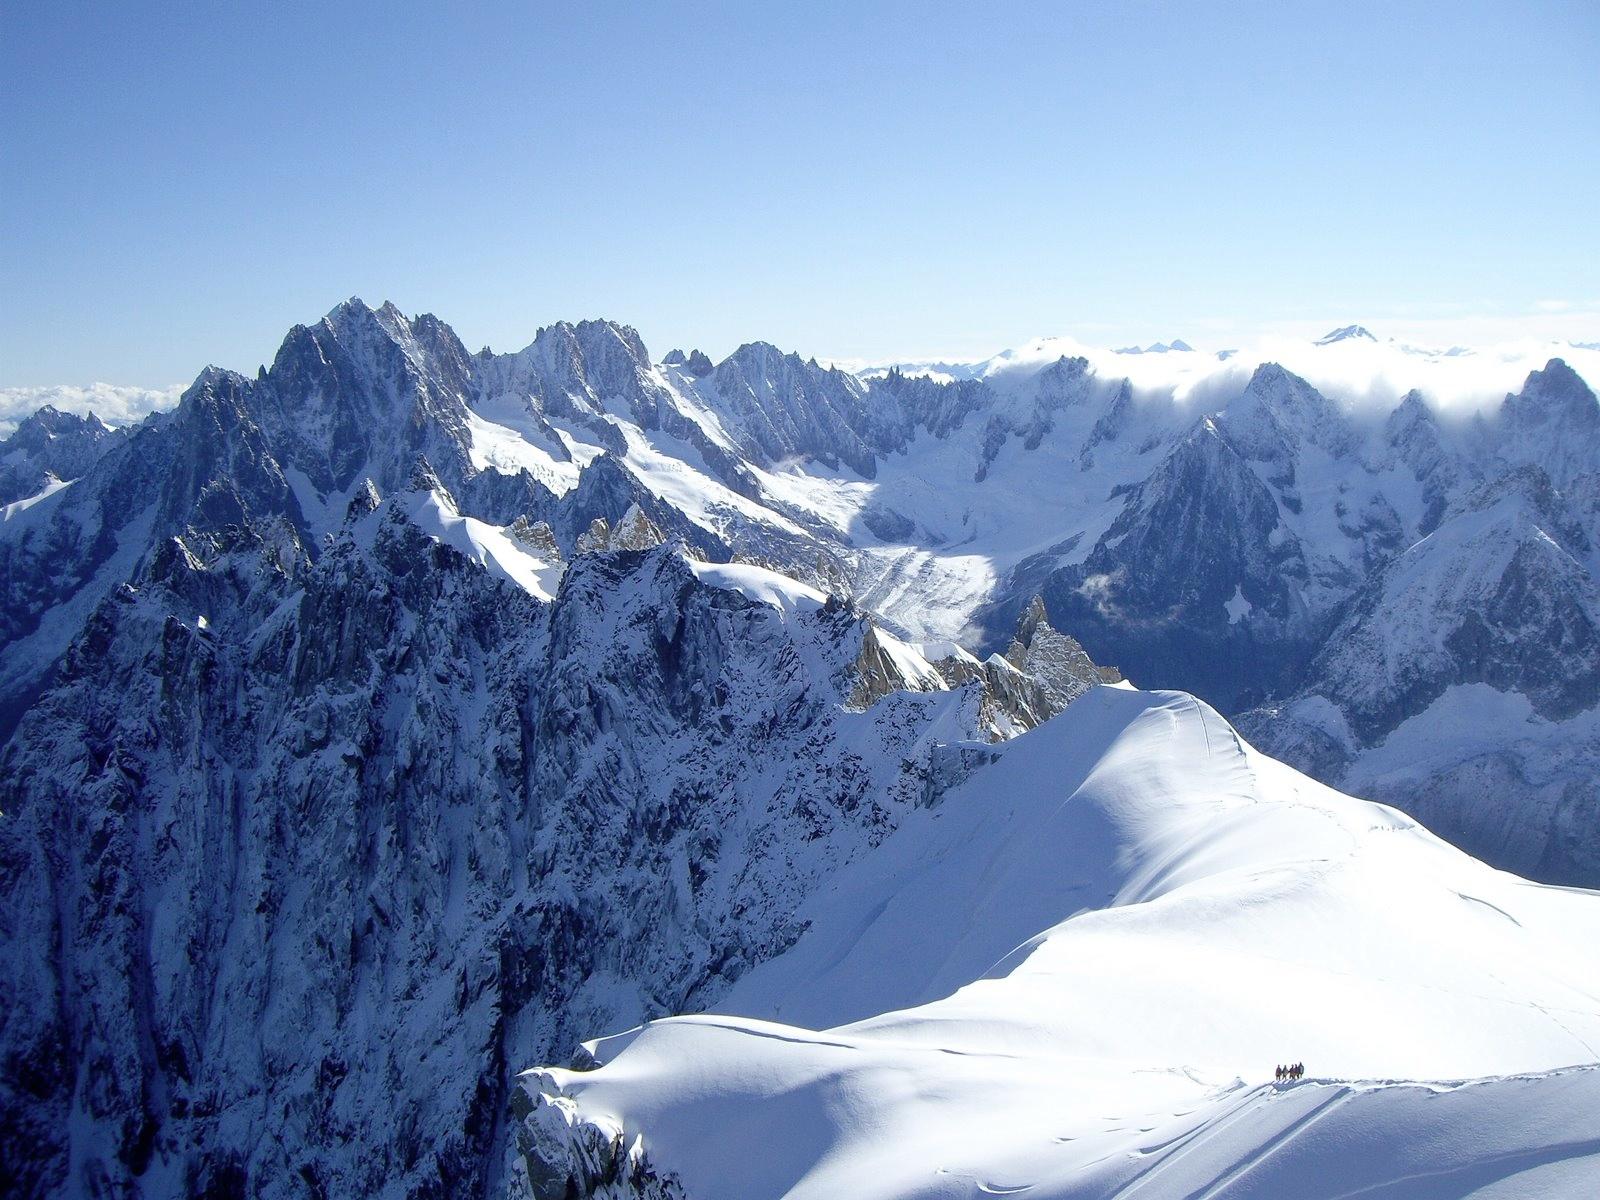 snow mountain wallpaper hd - photo #17